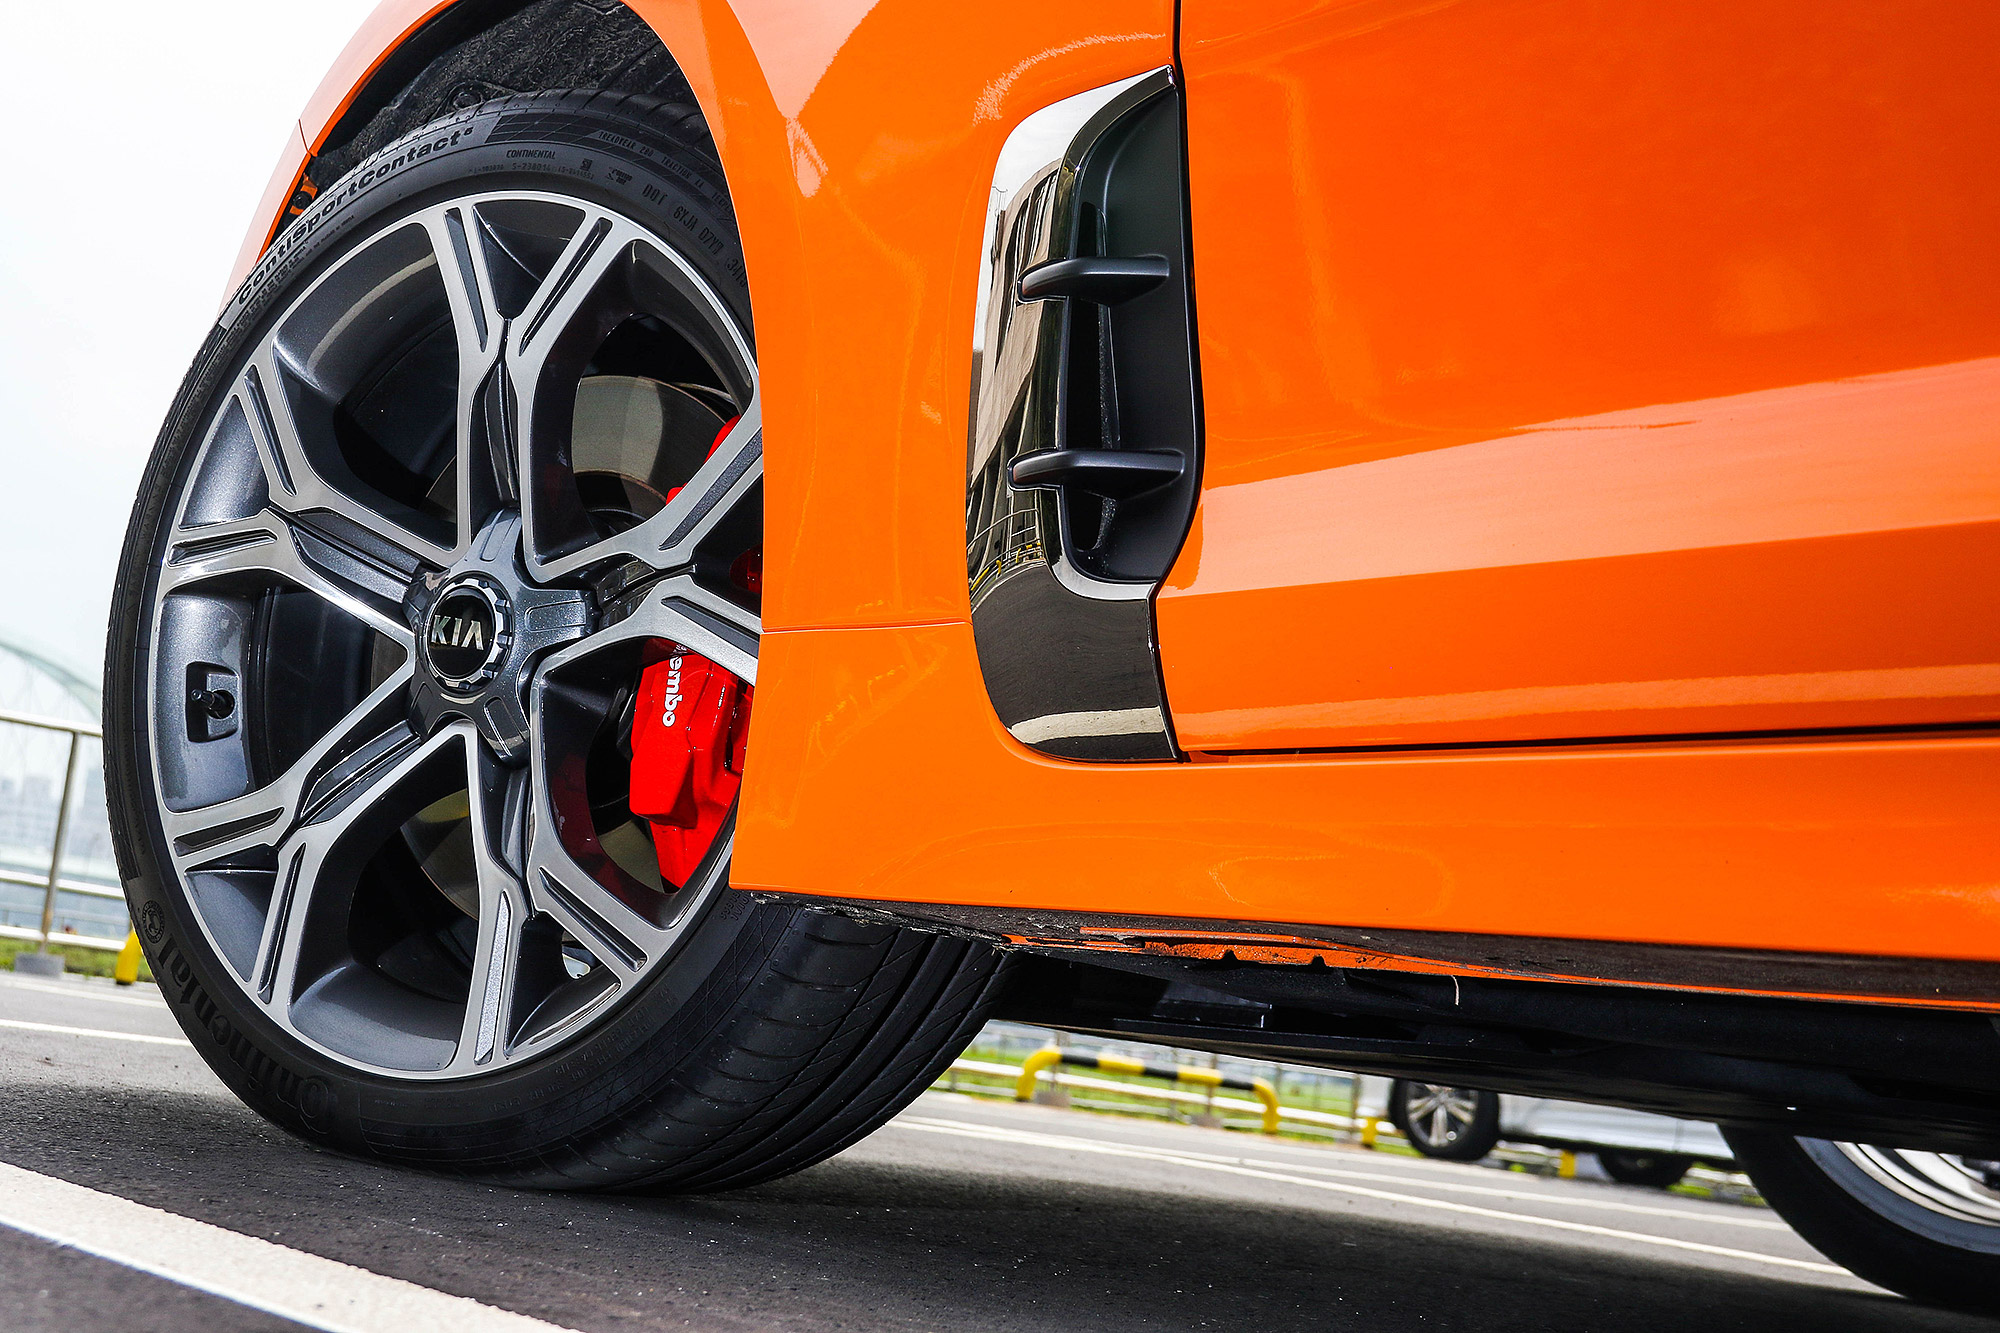 Stinger GT 標配 19 吋雙色輪圈與紅色 Brembo 煞車卡鉗。